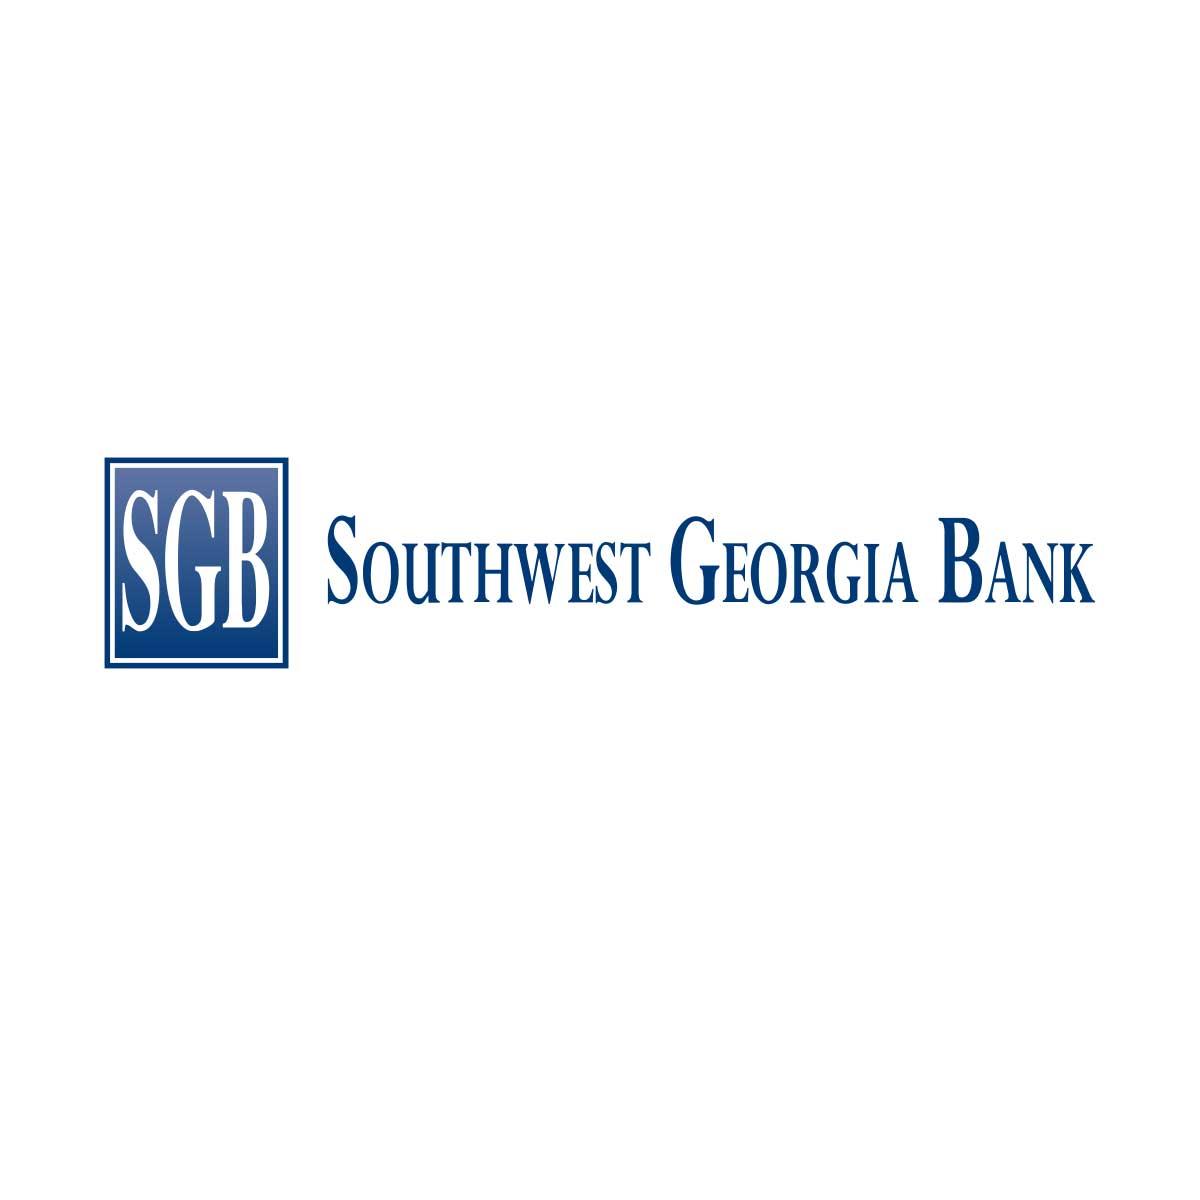 Southwest Georgia Bank